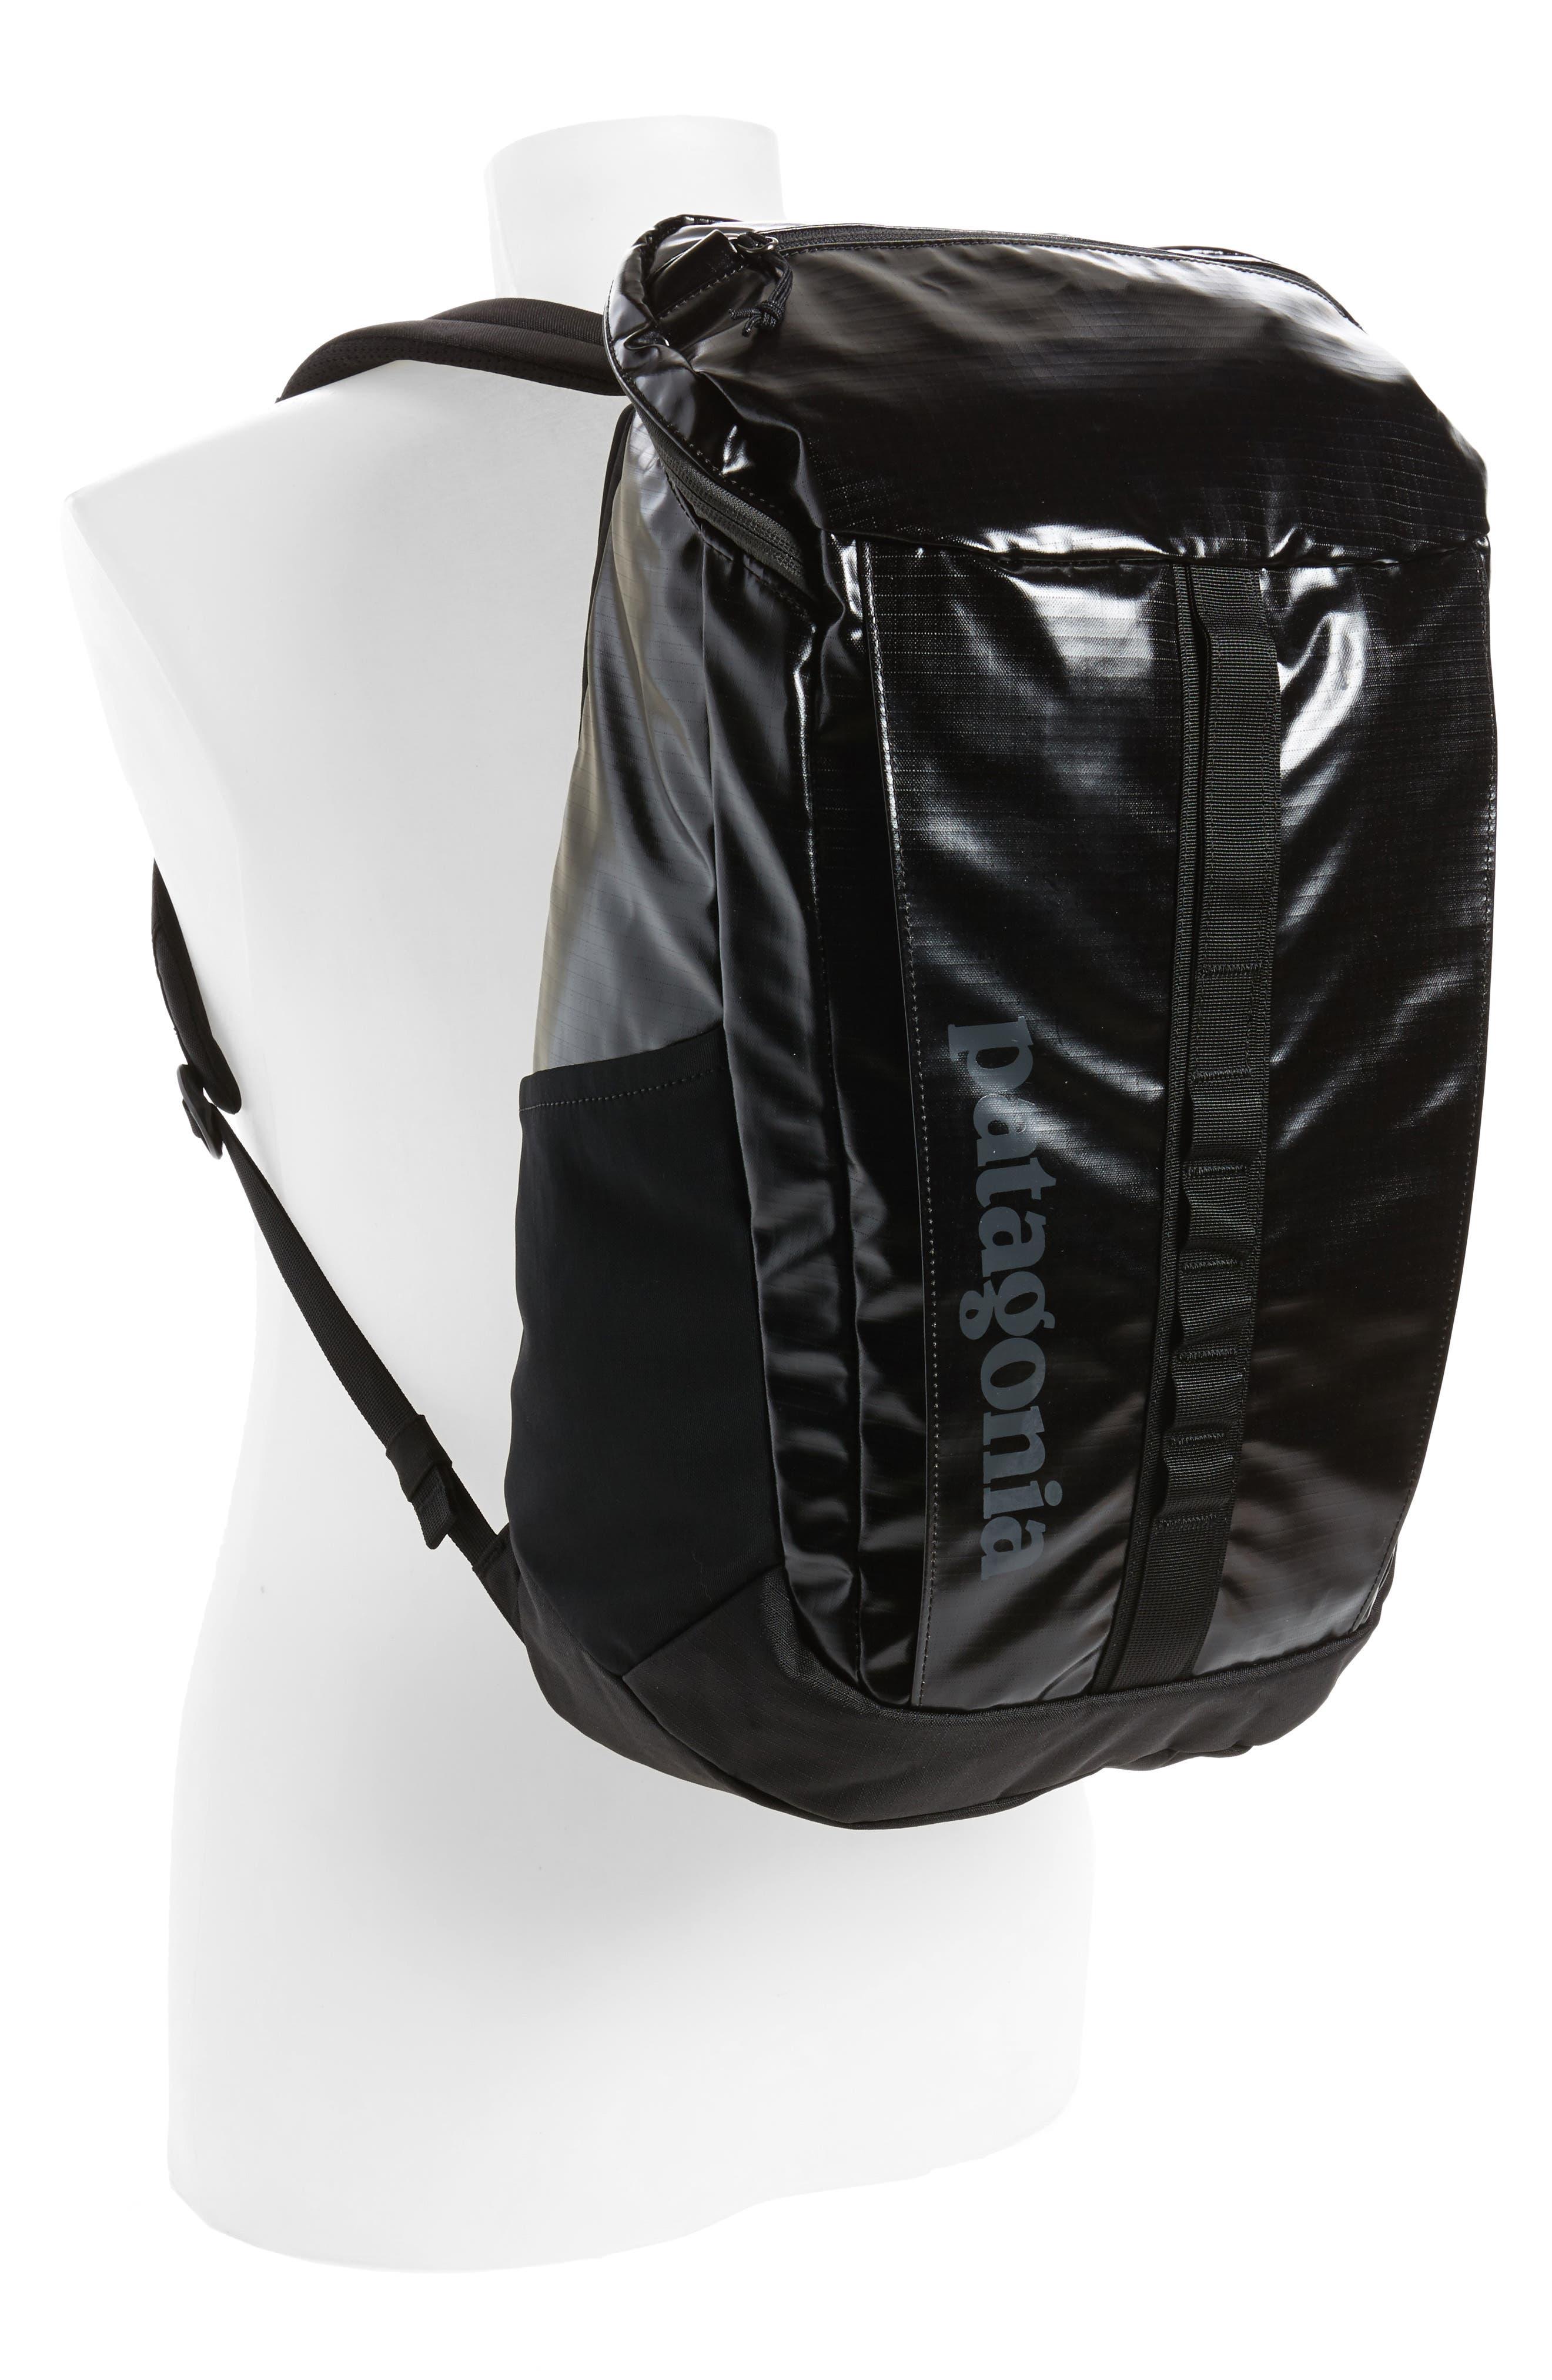 Black Hole 25 Liter Backpack,                             Alternate thumbnail 2, color,                             Black